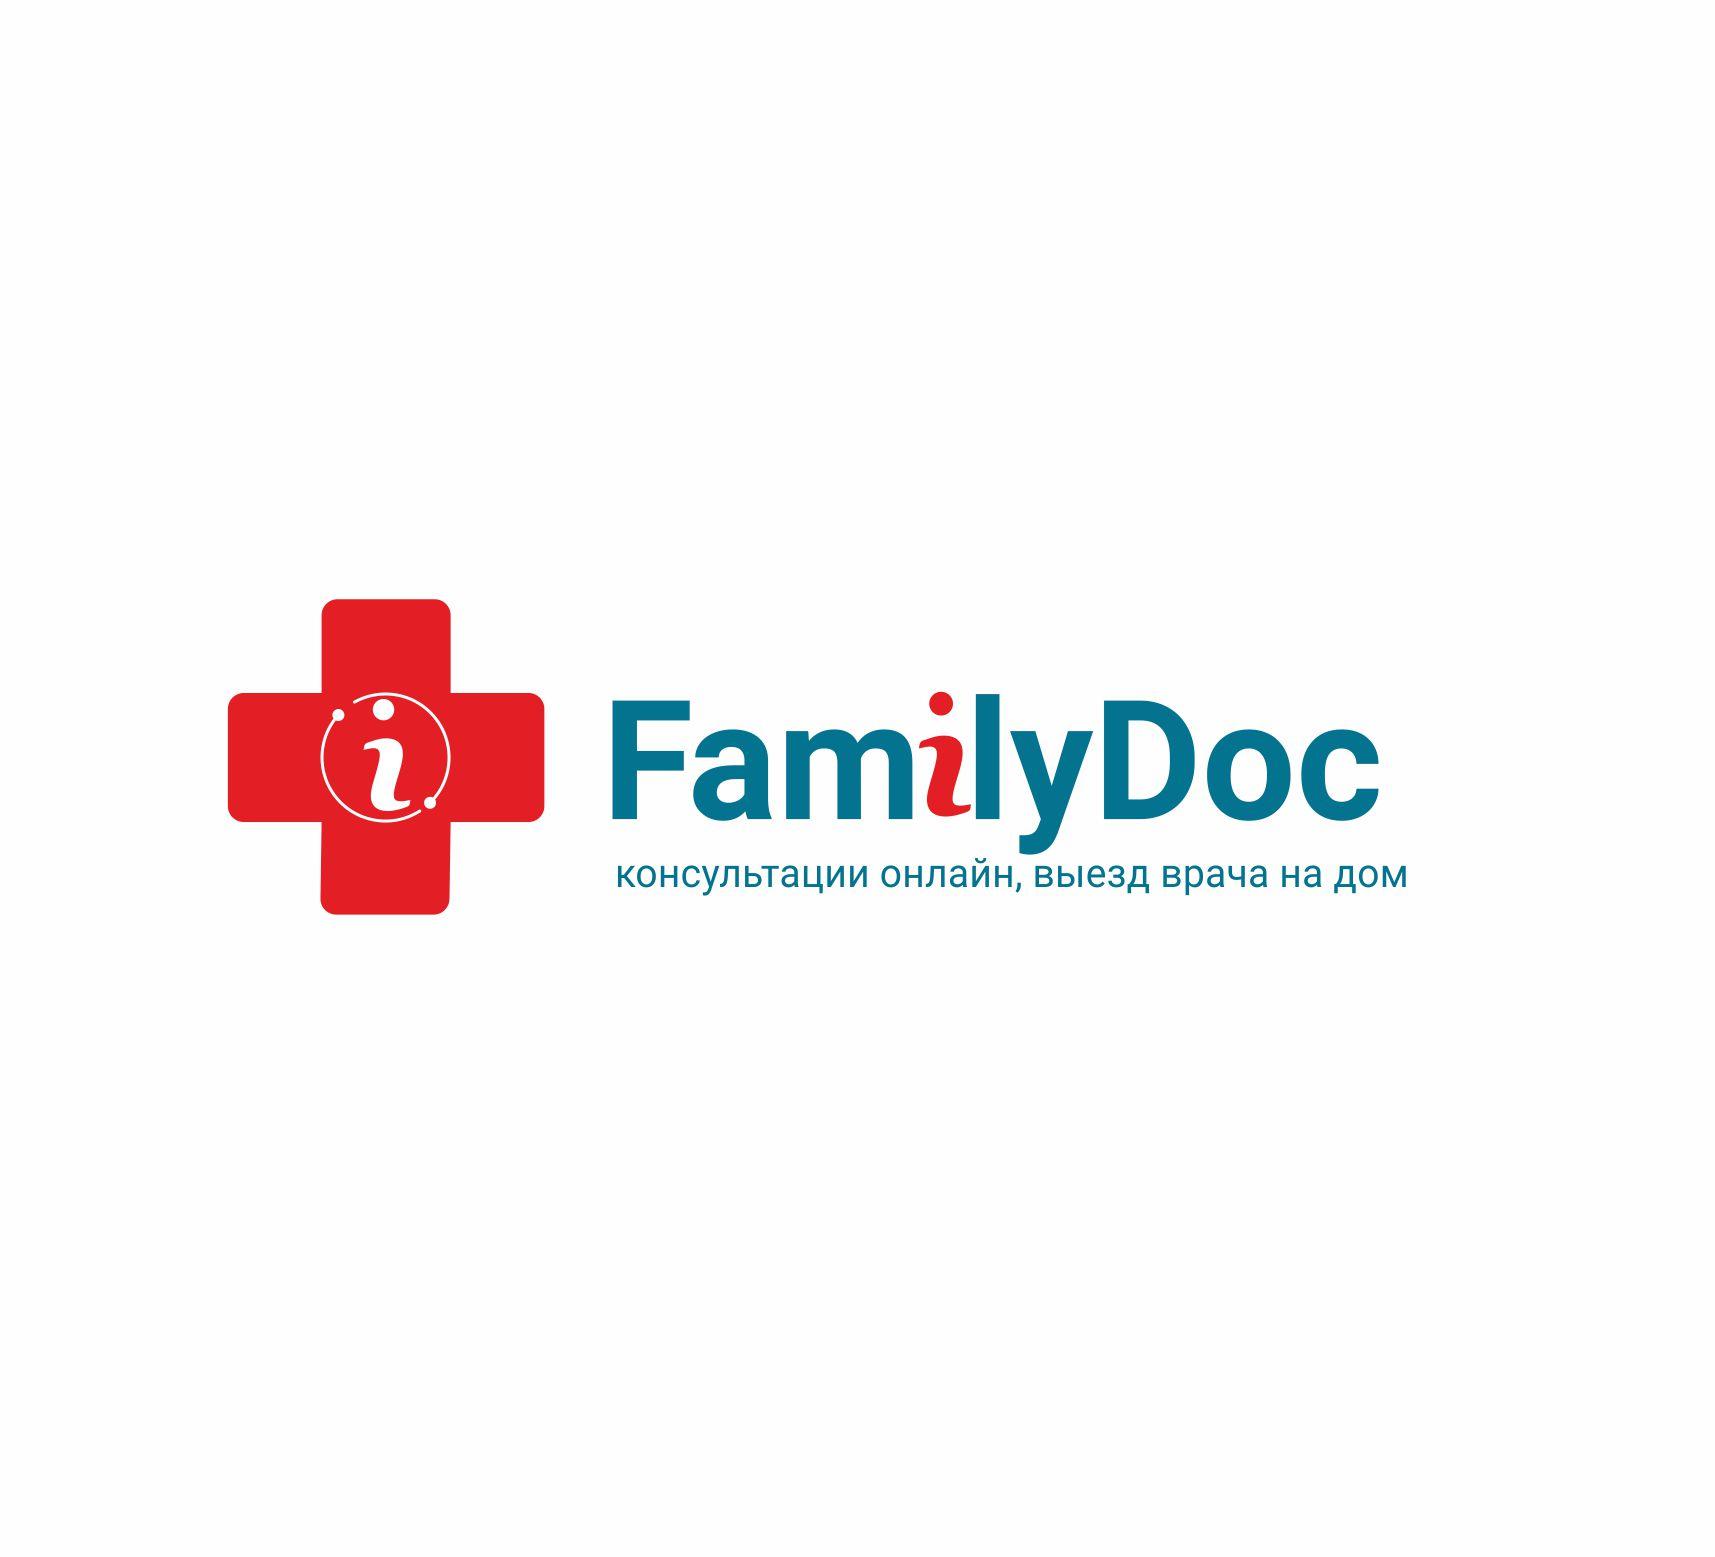 Разработка логотипа для врачебного онлайн сервиса FamilyDoc фото f_1475c348a5dd69db.jpg